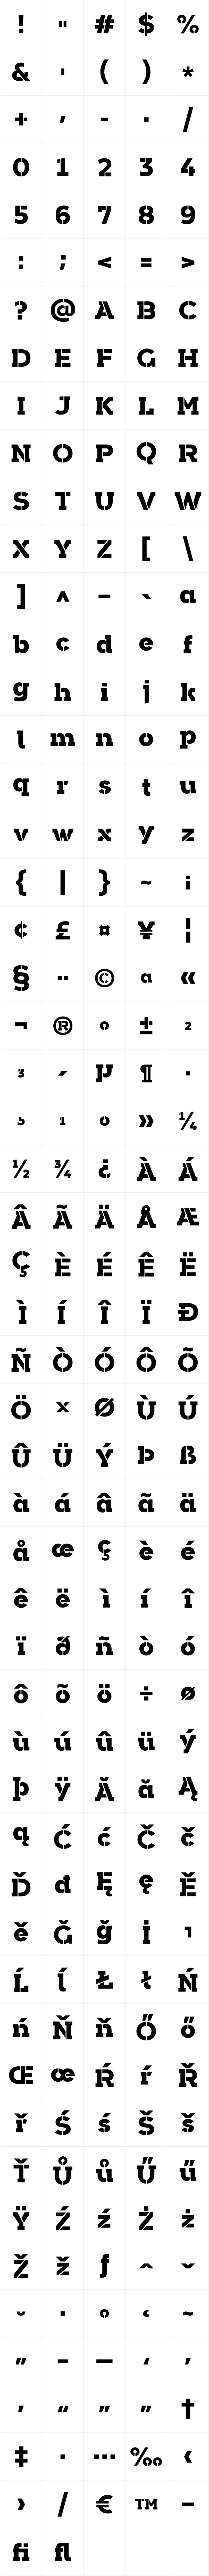 Arkibal Serif Stencil Heavy